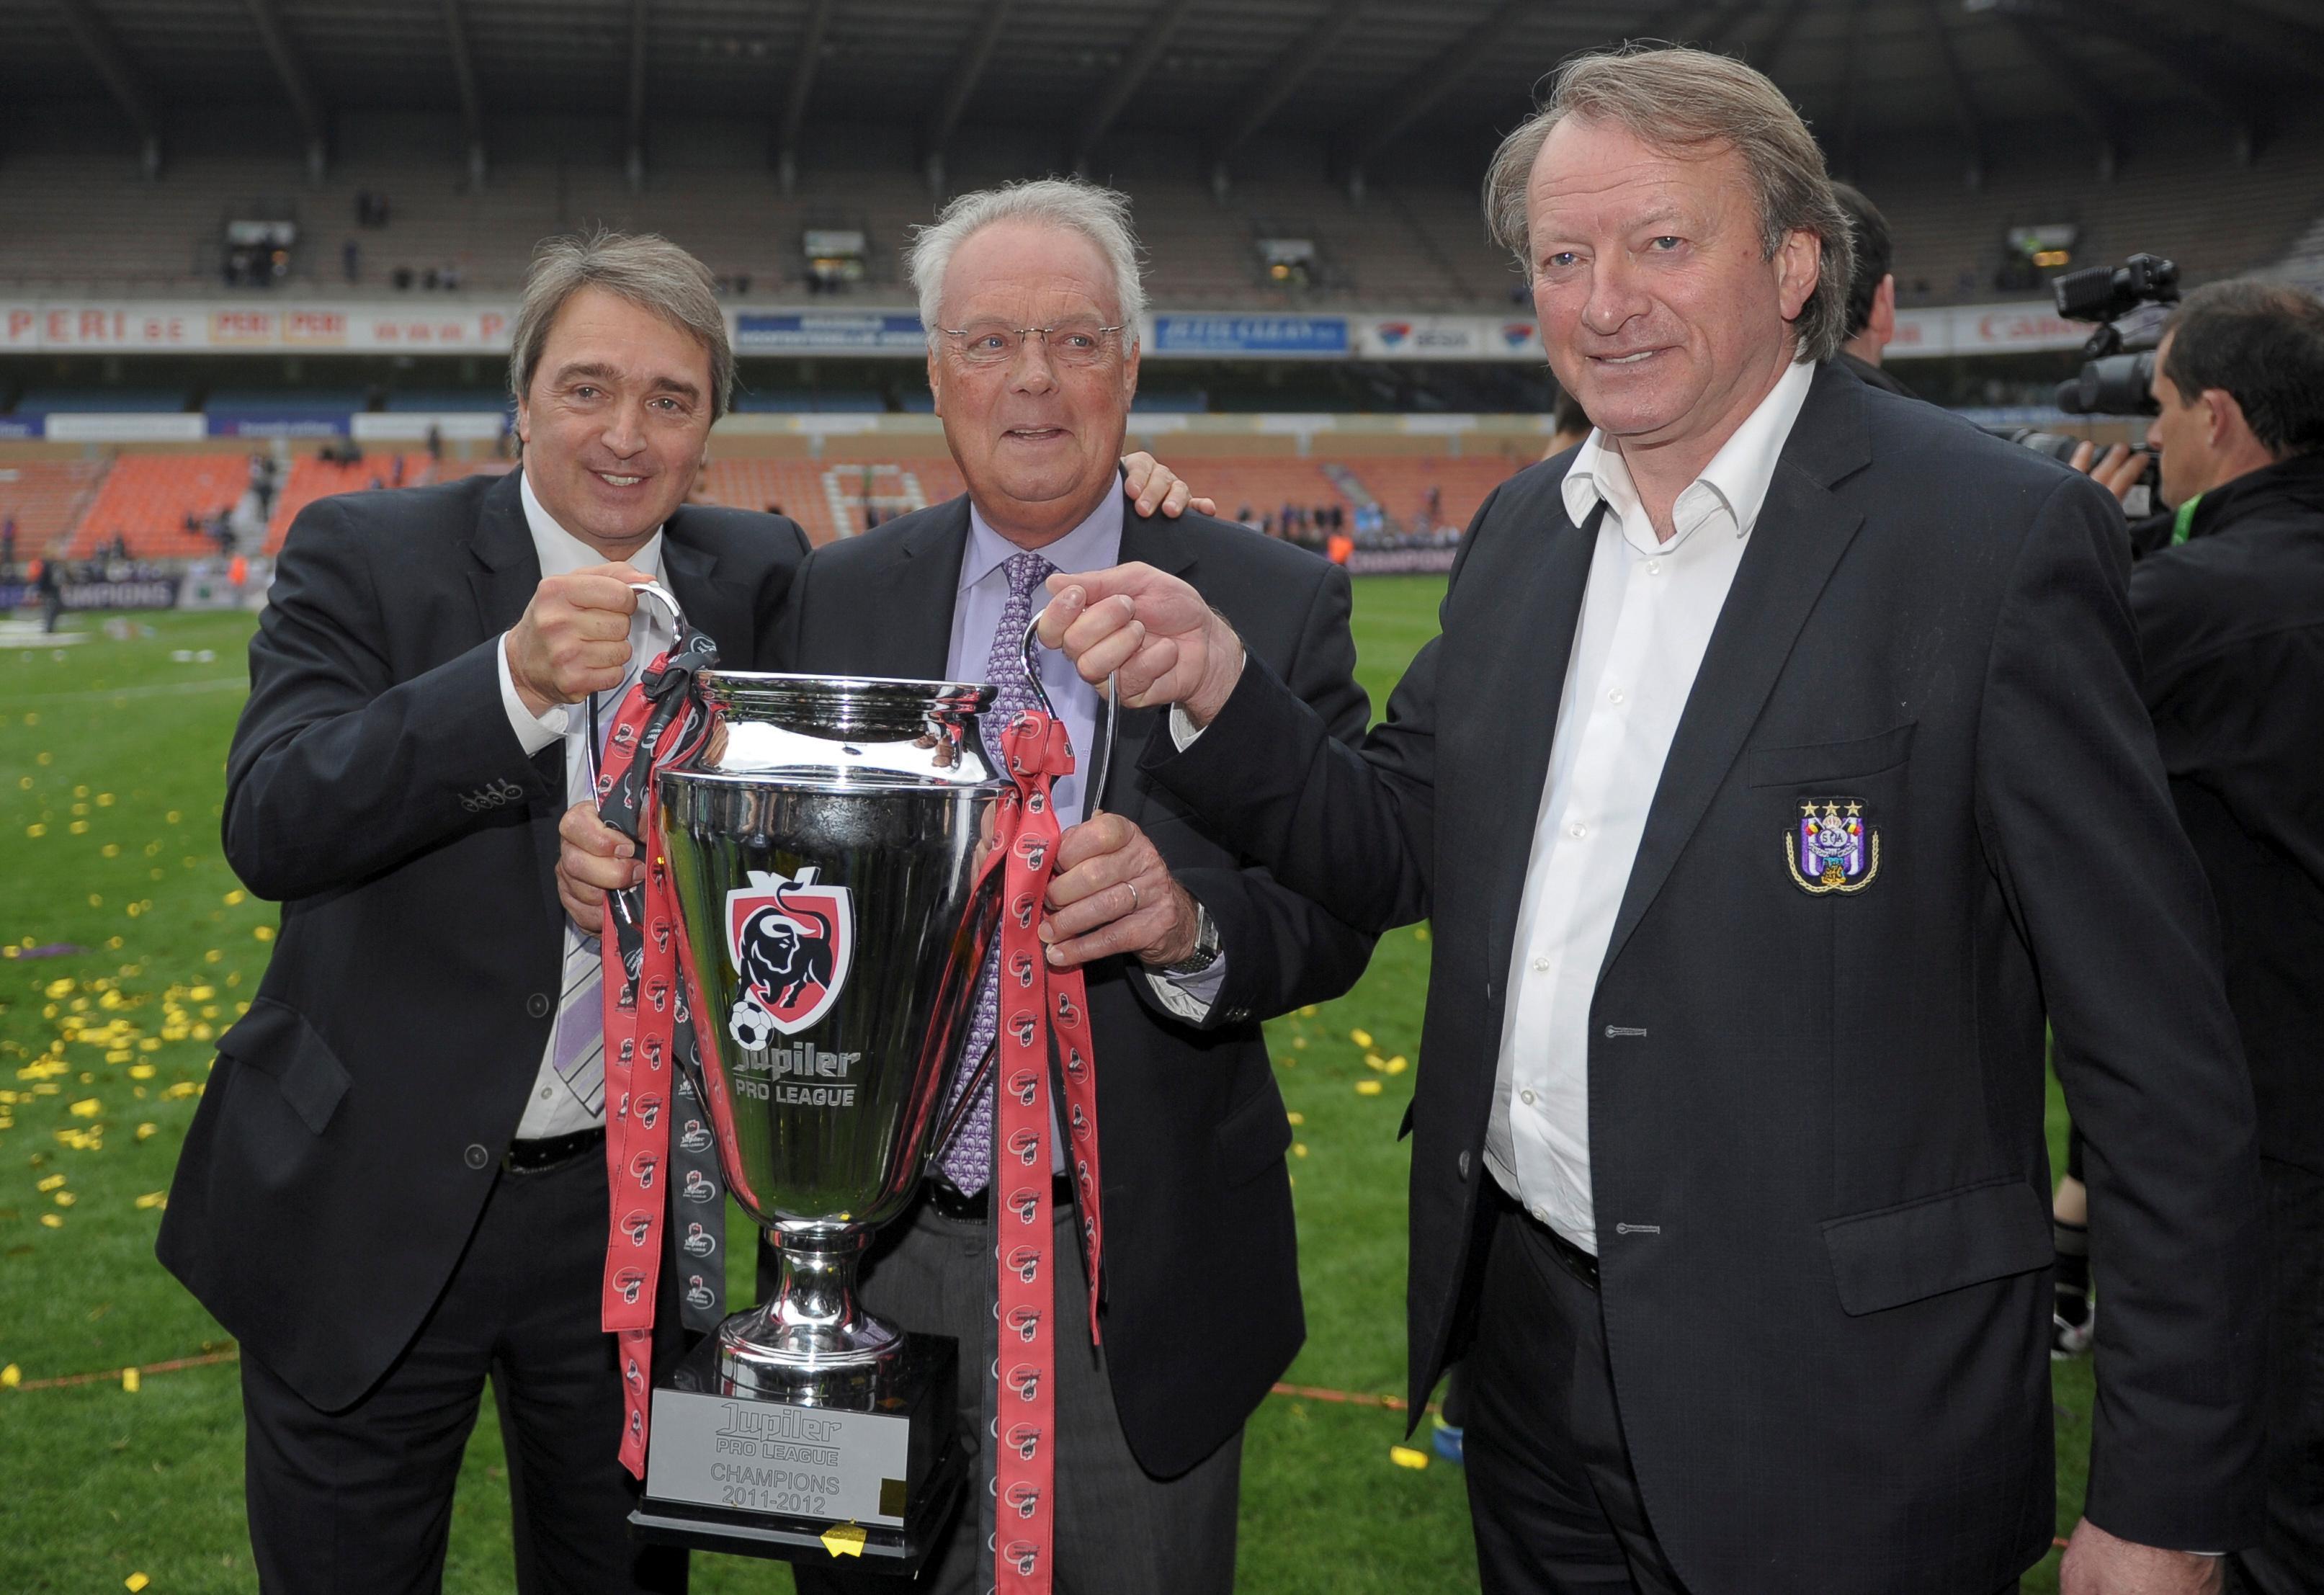 Former Anderlecht general manager arrested in widening fraud sting